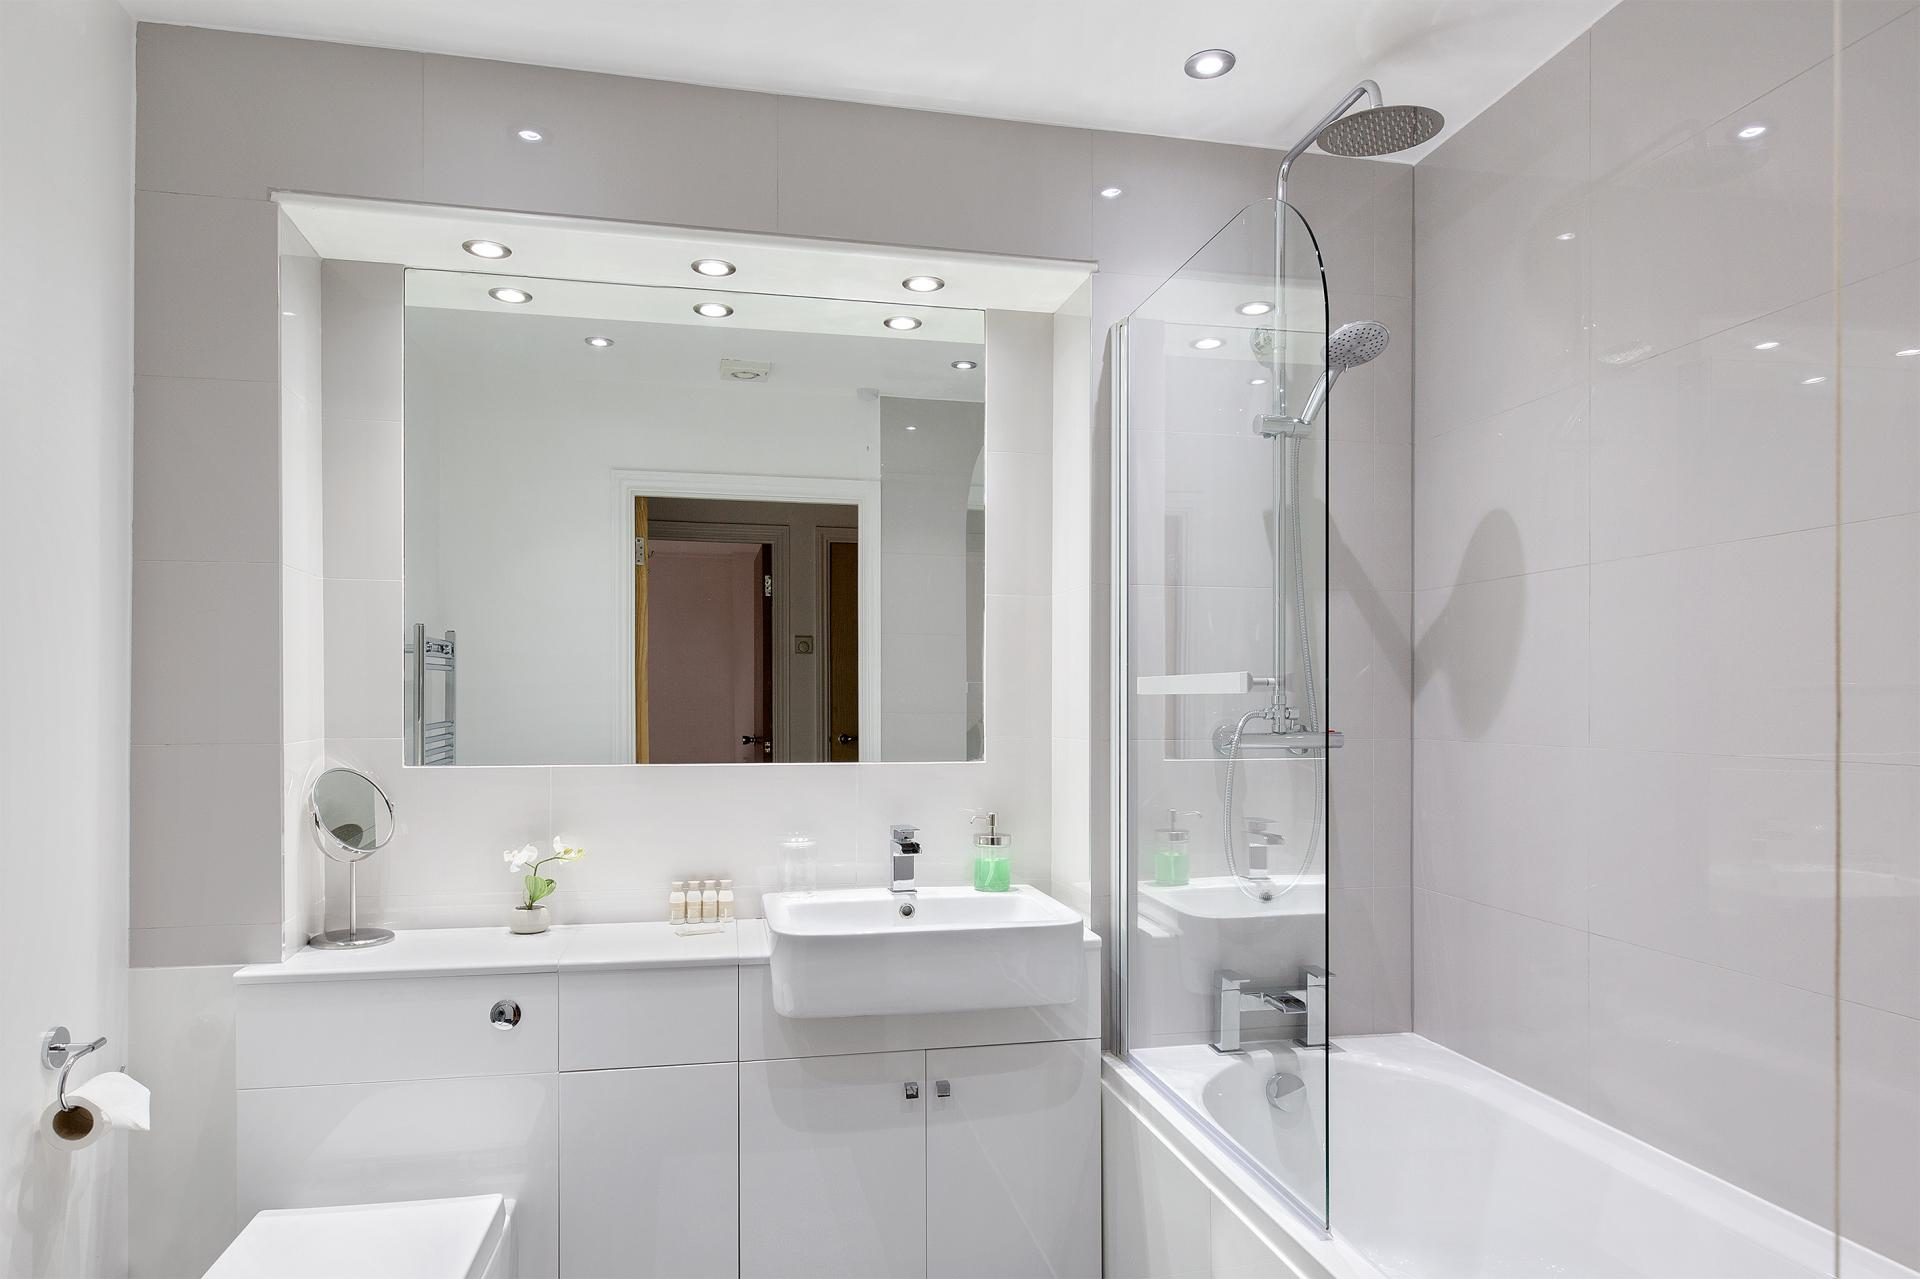 Bathroom at Serenity Apartment, Whitechapel, London - Citybase Apartments